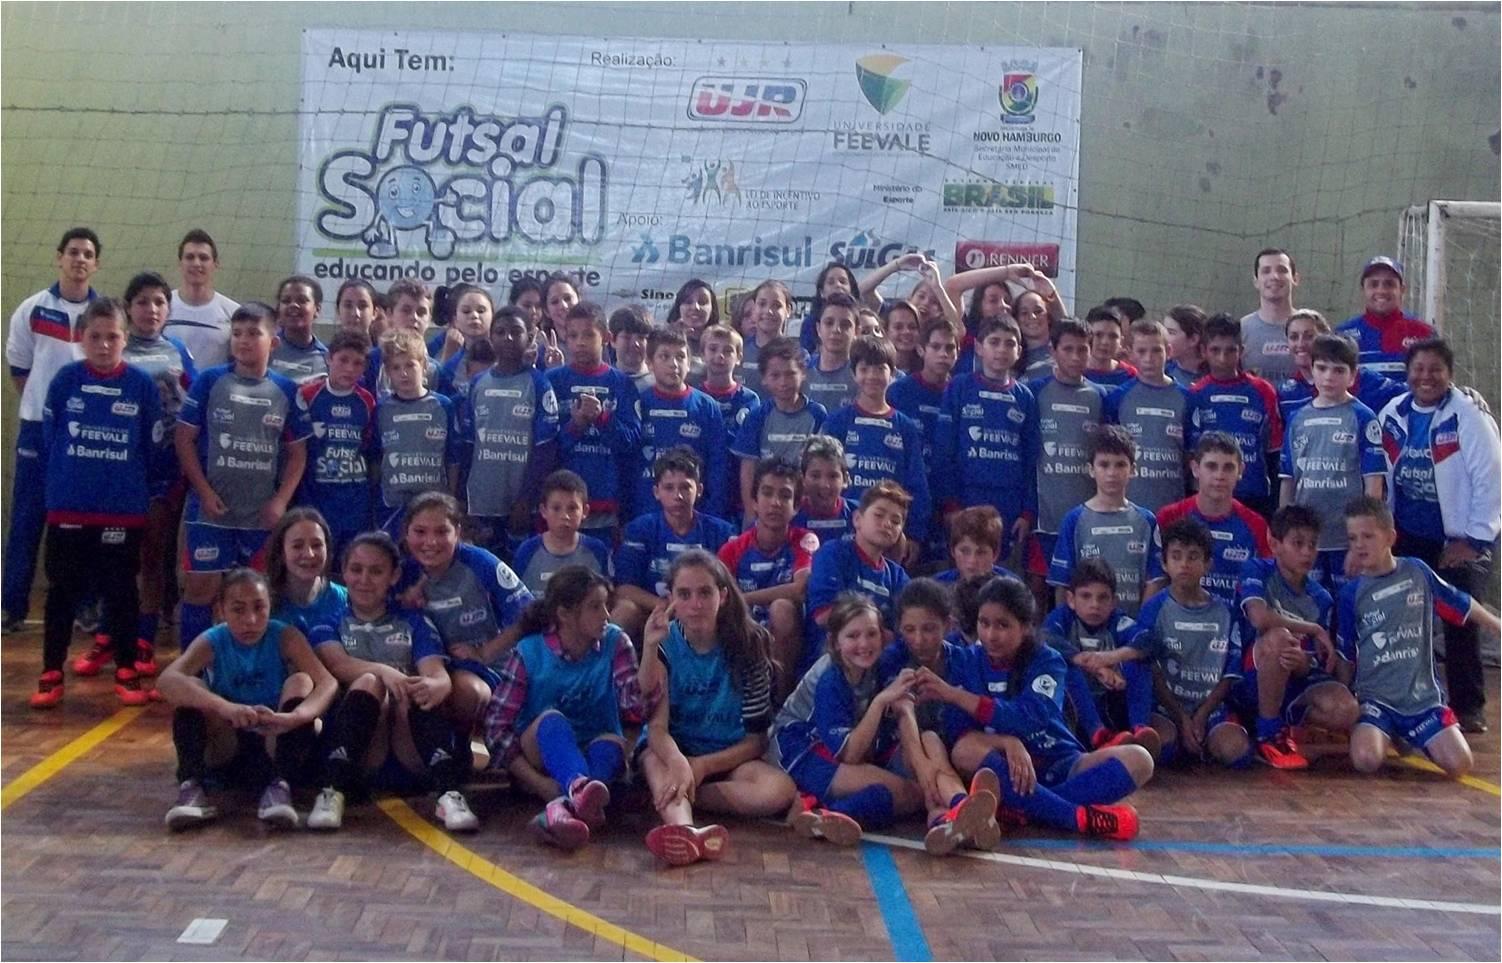 Futsal Social